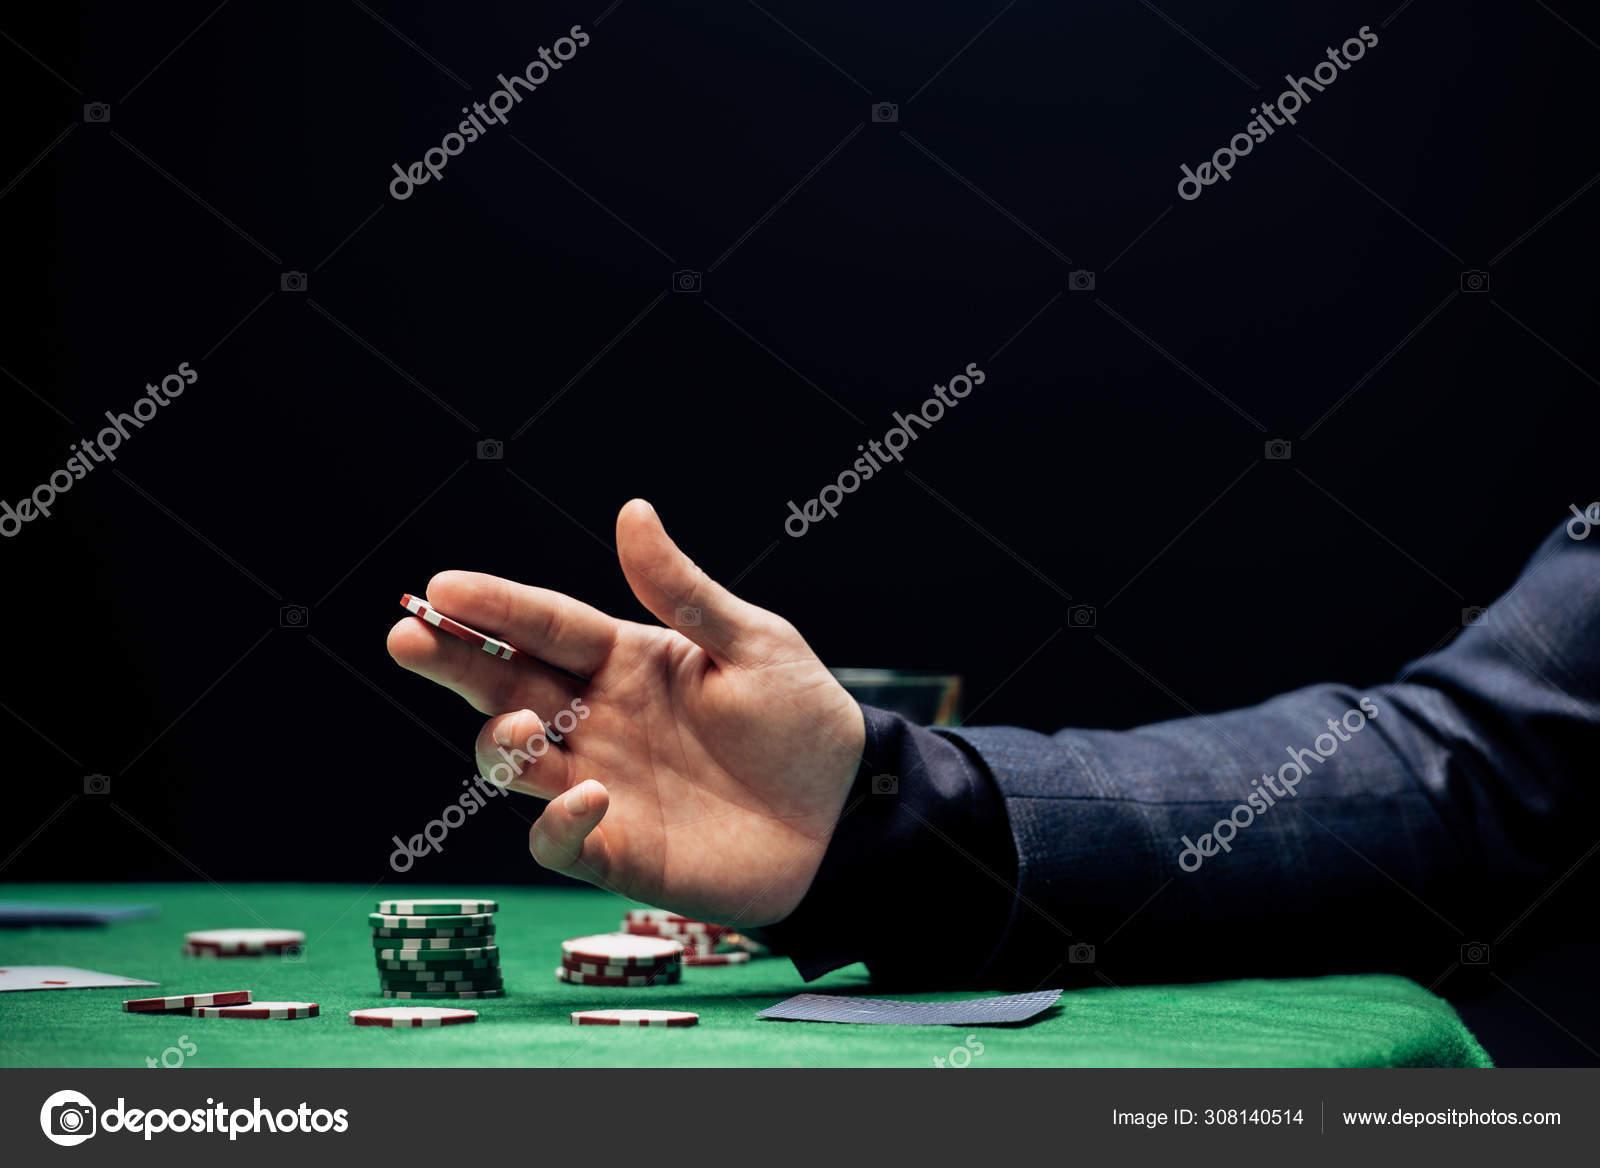 Kyiv Ukraine Harus 2019 Dipangkas Pandangan Manusia Memegang Koin Poker Stok Foto Editorial C Vitalikradko 308140514